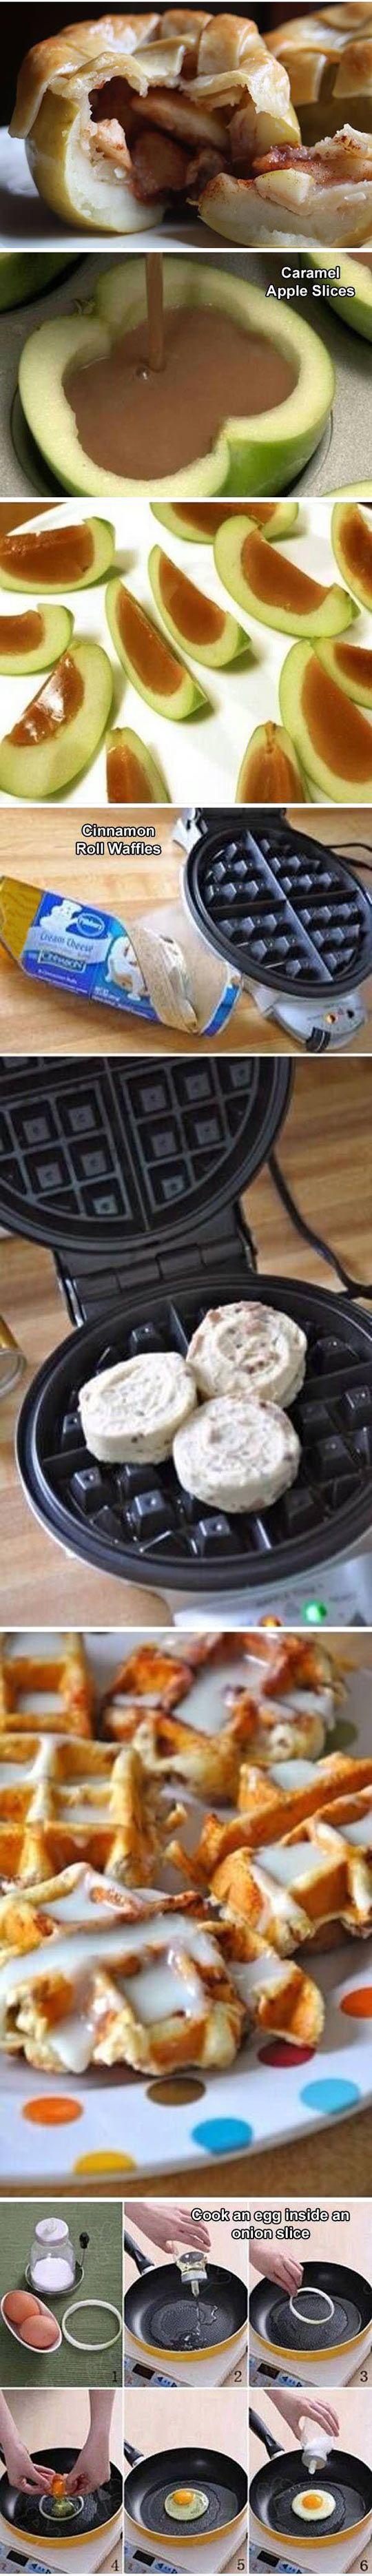 Food hacks everyone should know…